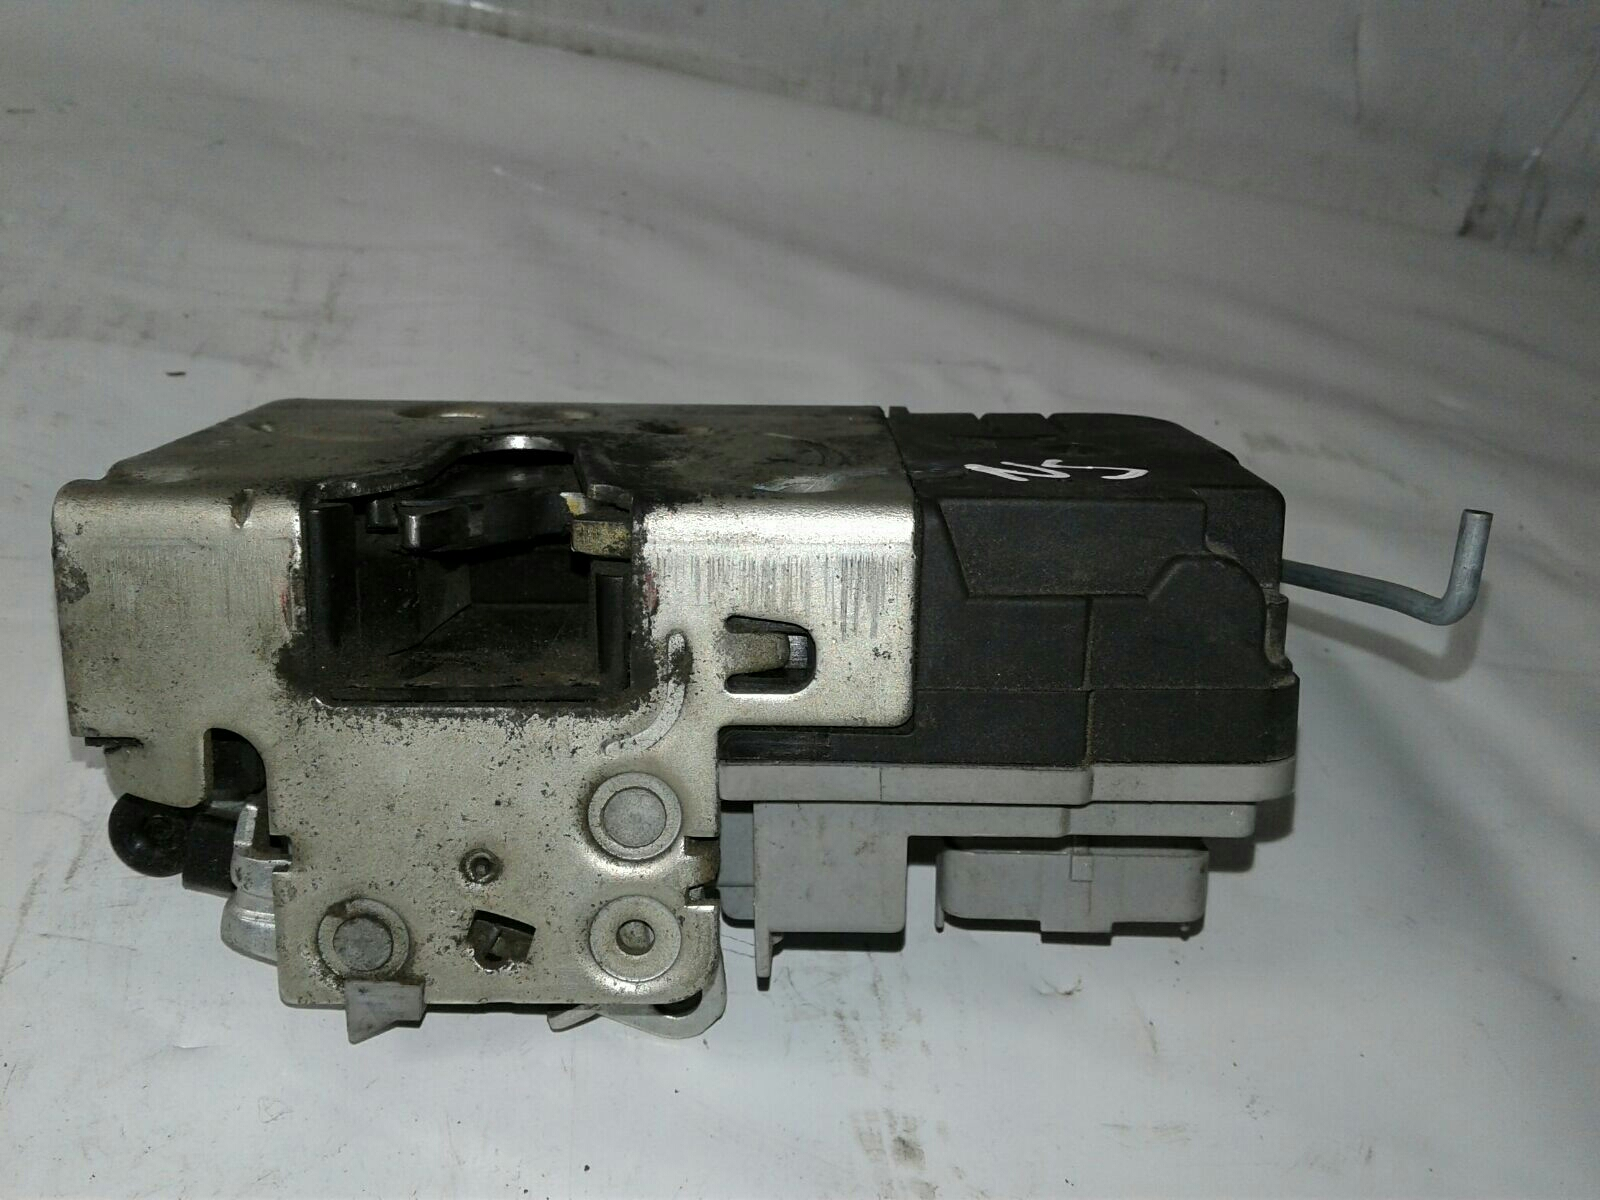 Peugeot 206 1998 To 2009 Door Front Central Locking Solenoid Lh Fuse Box Lock 2006 Passenger Actuator 5196318